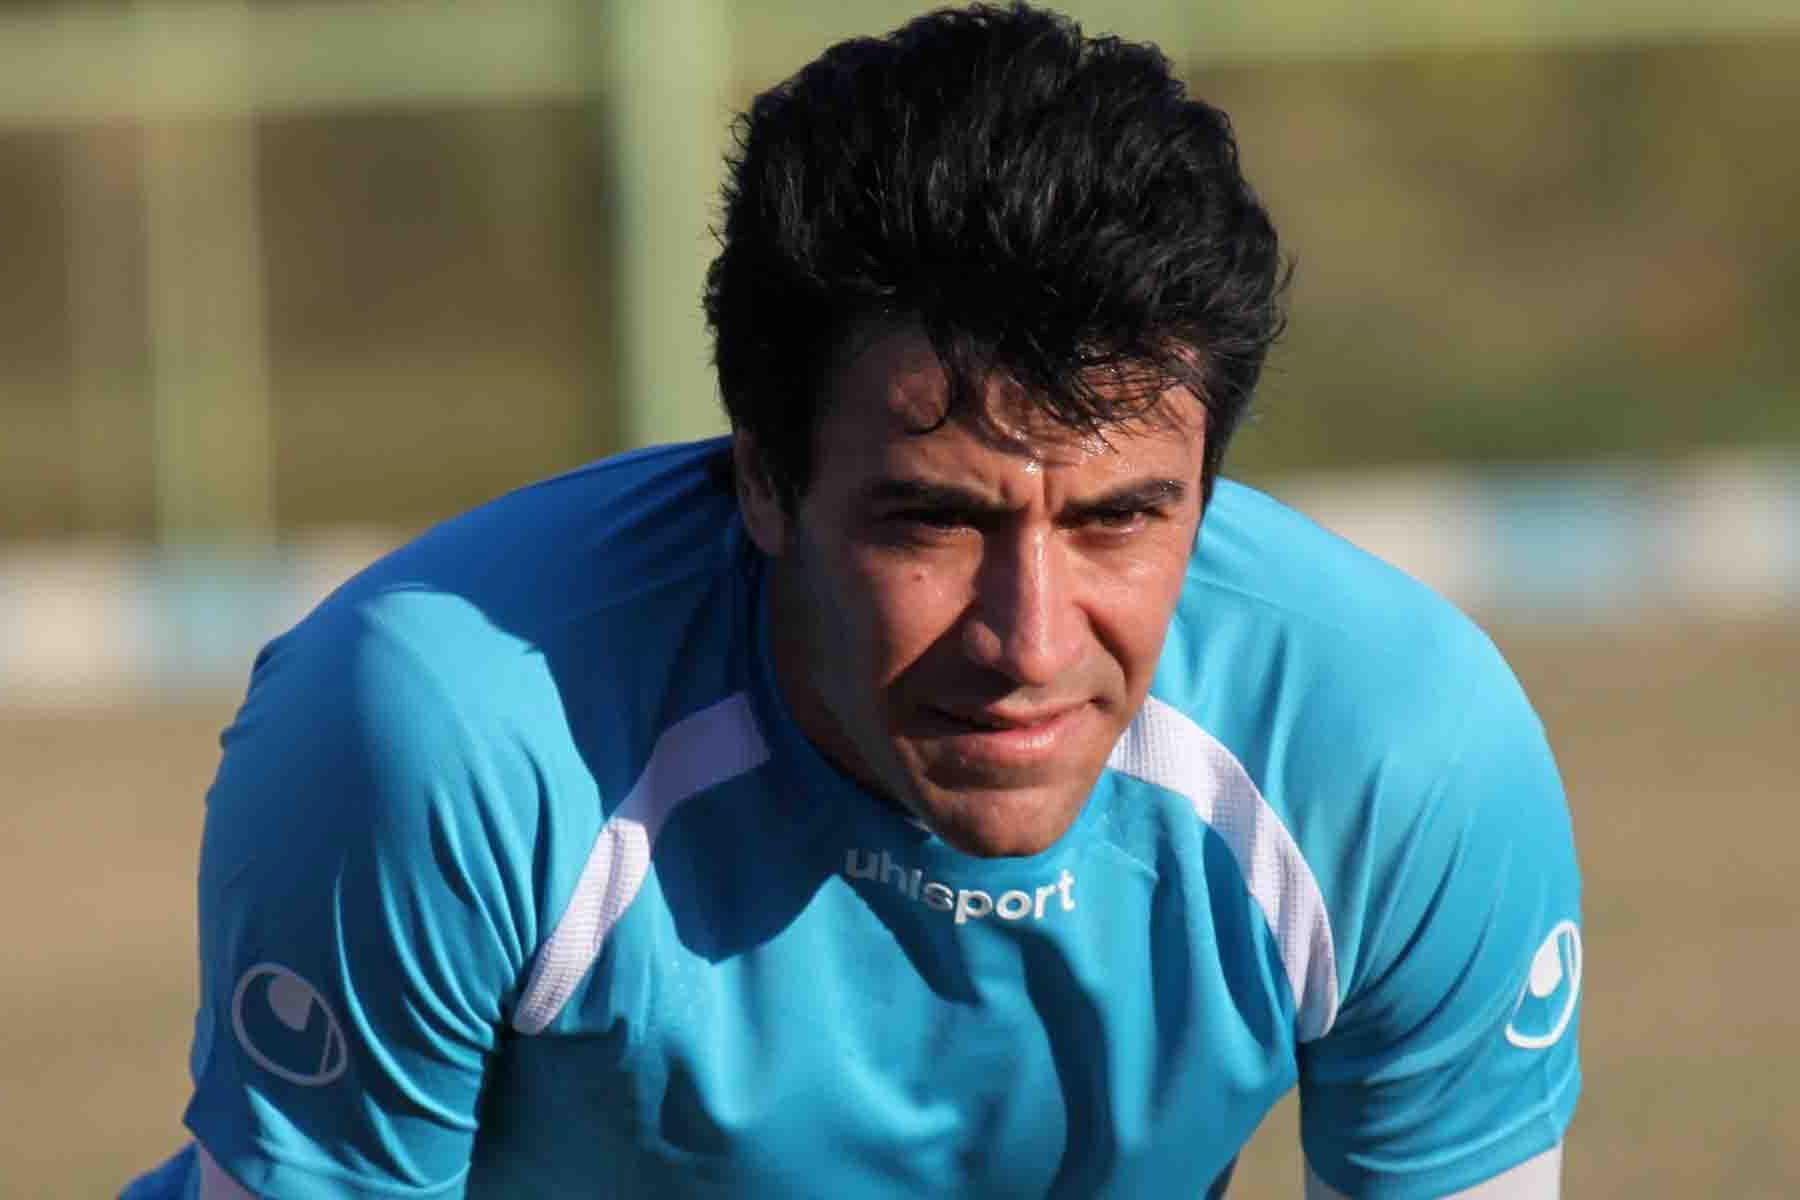 لیگ ایران-استقلال-persian league-esteghlal